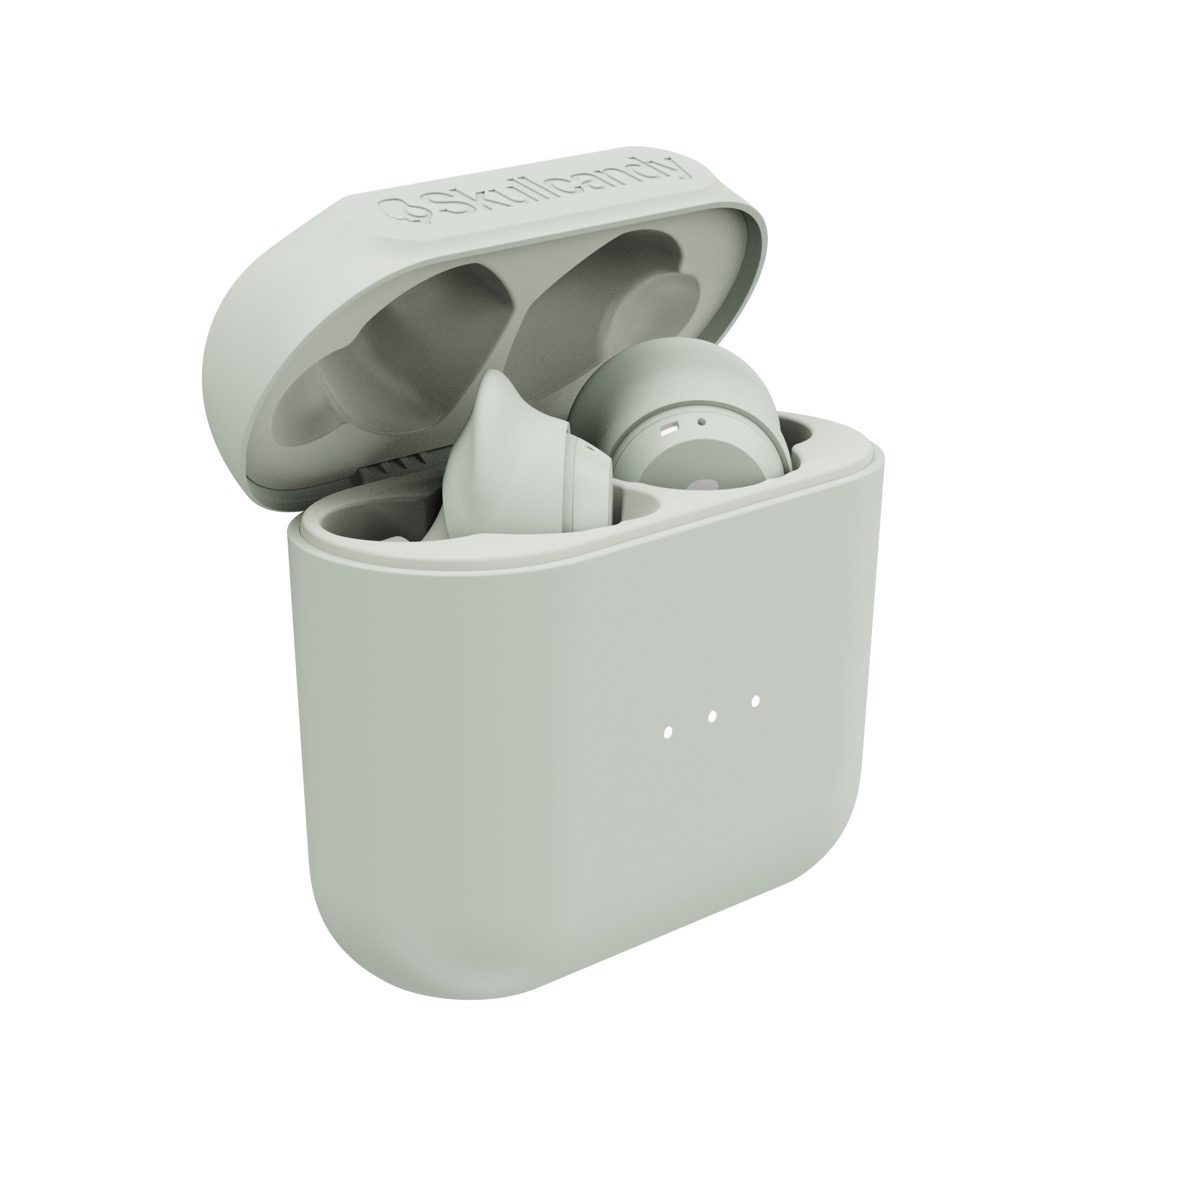 skullcandy schickt indy true wireless in ears ins rennen. Black Bedroom Furniture Sets. Home Design Ideas